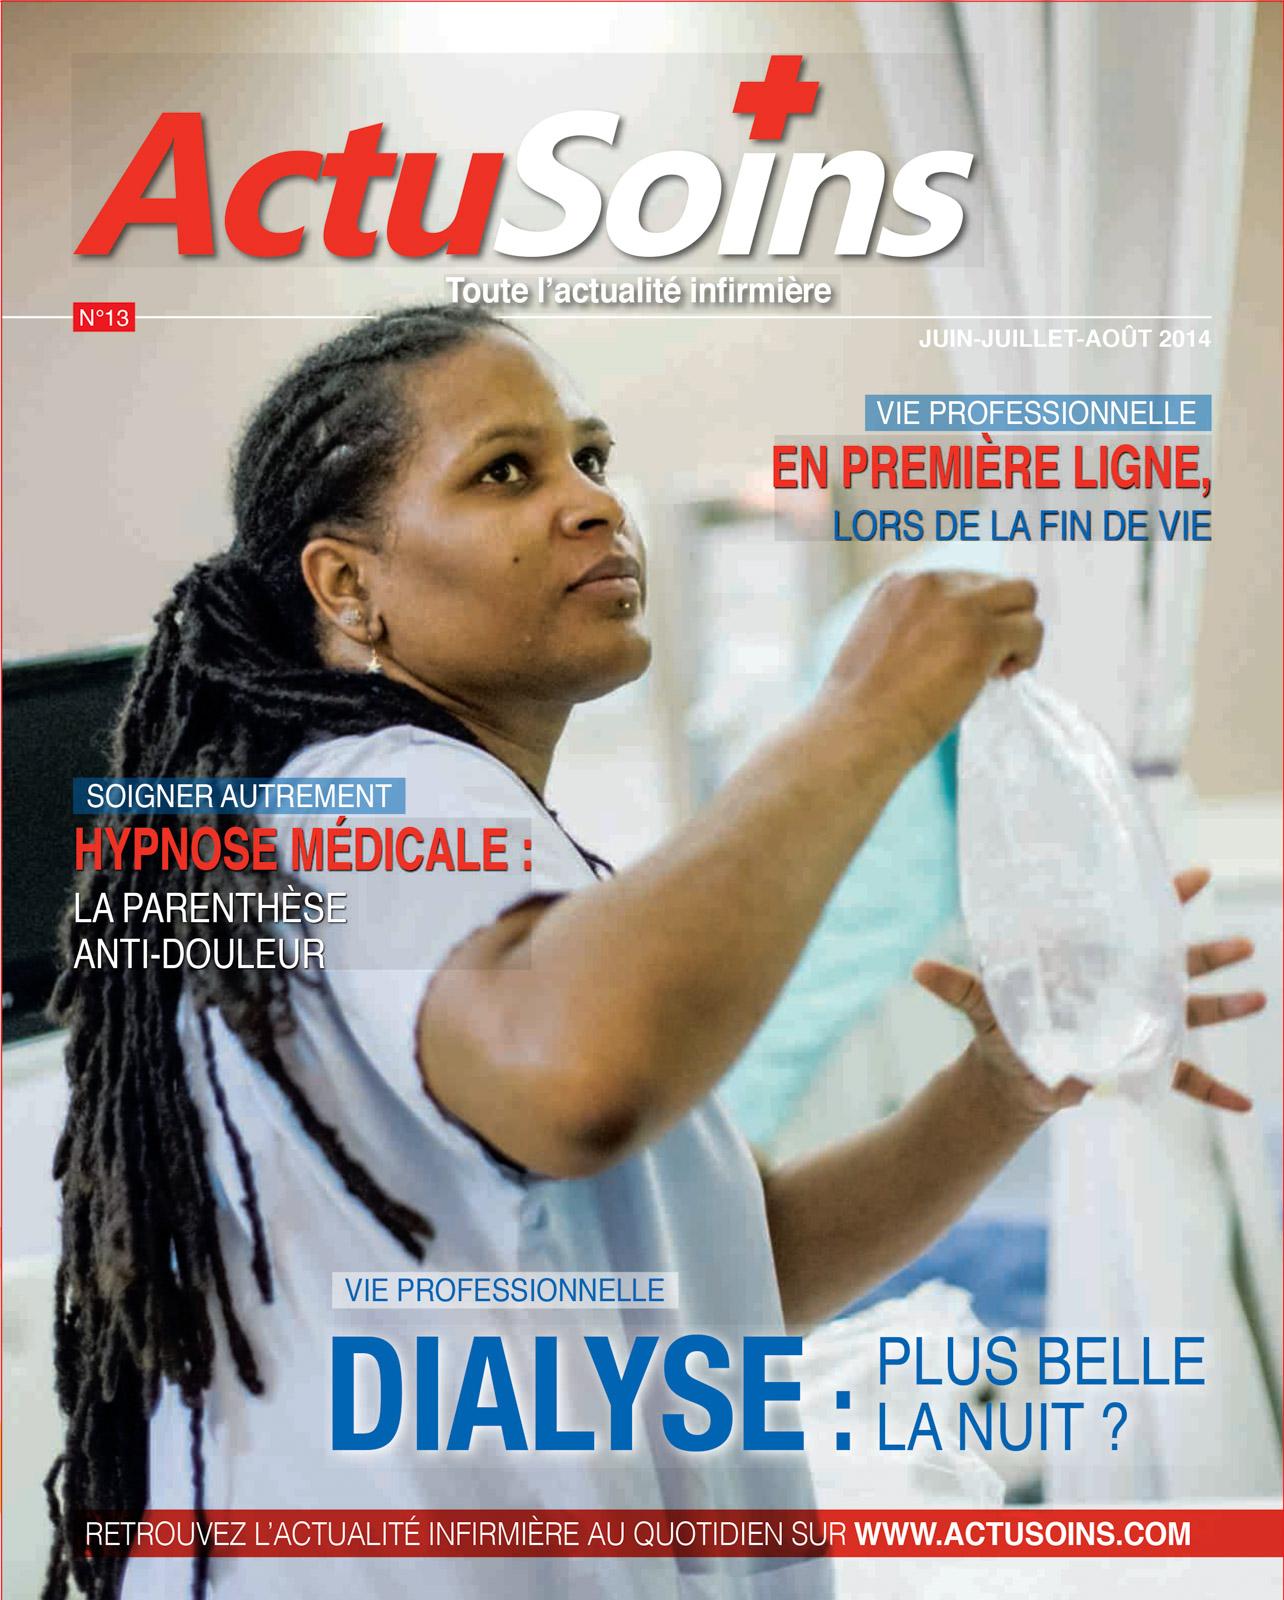 ACTUSOINS-N-13_couv-1web